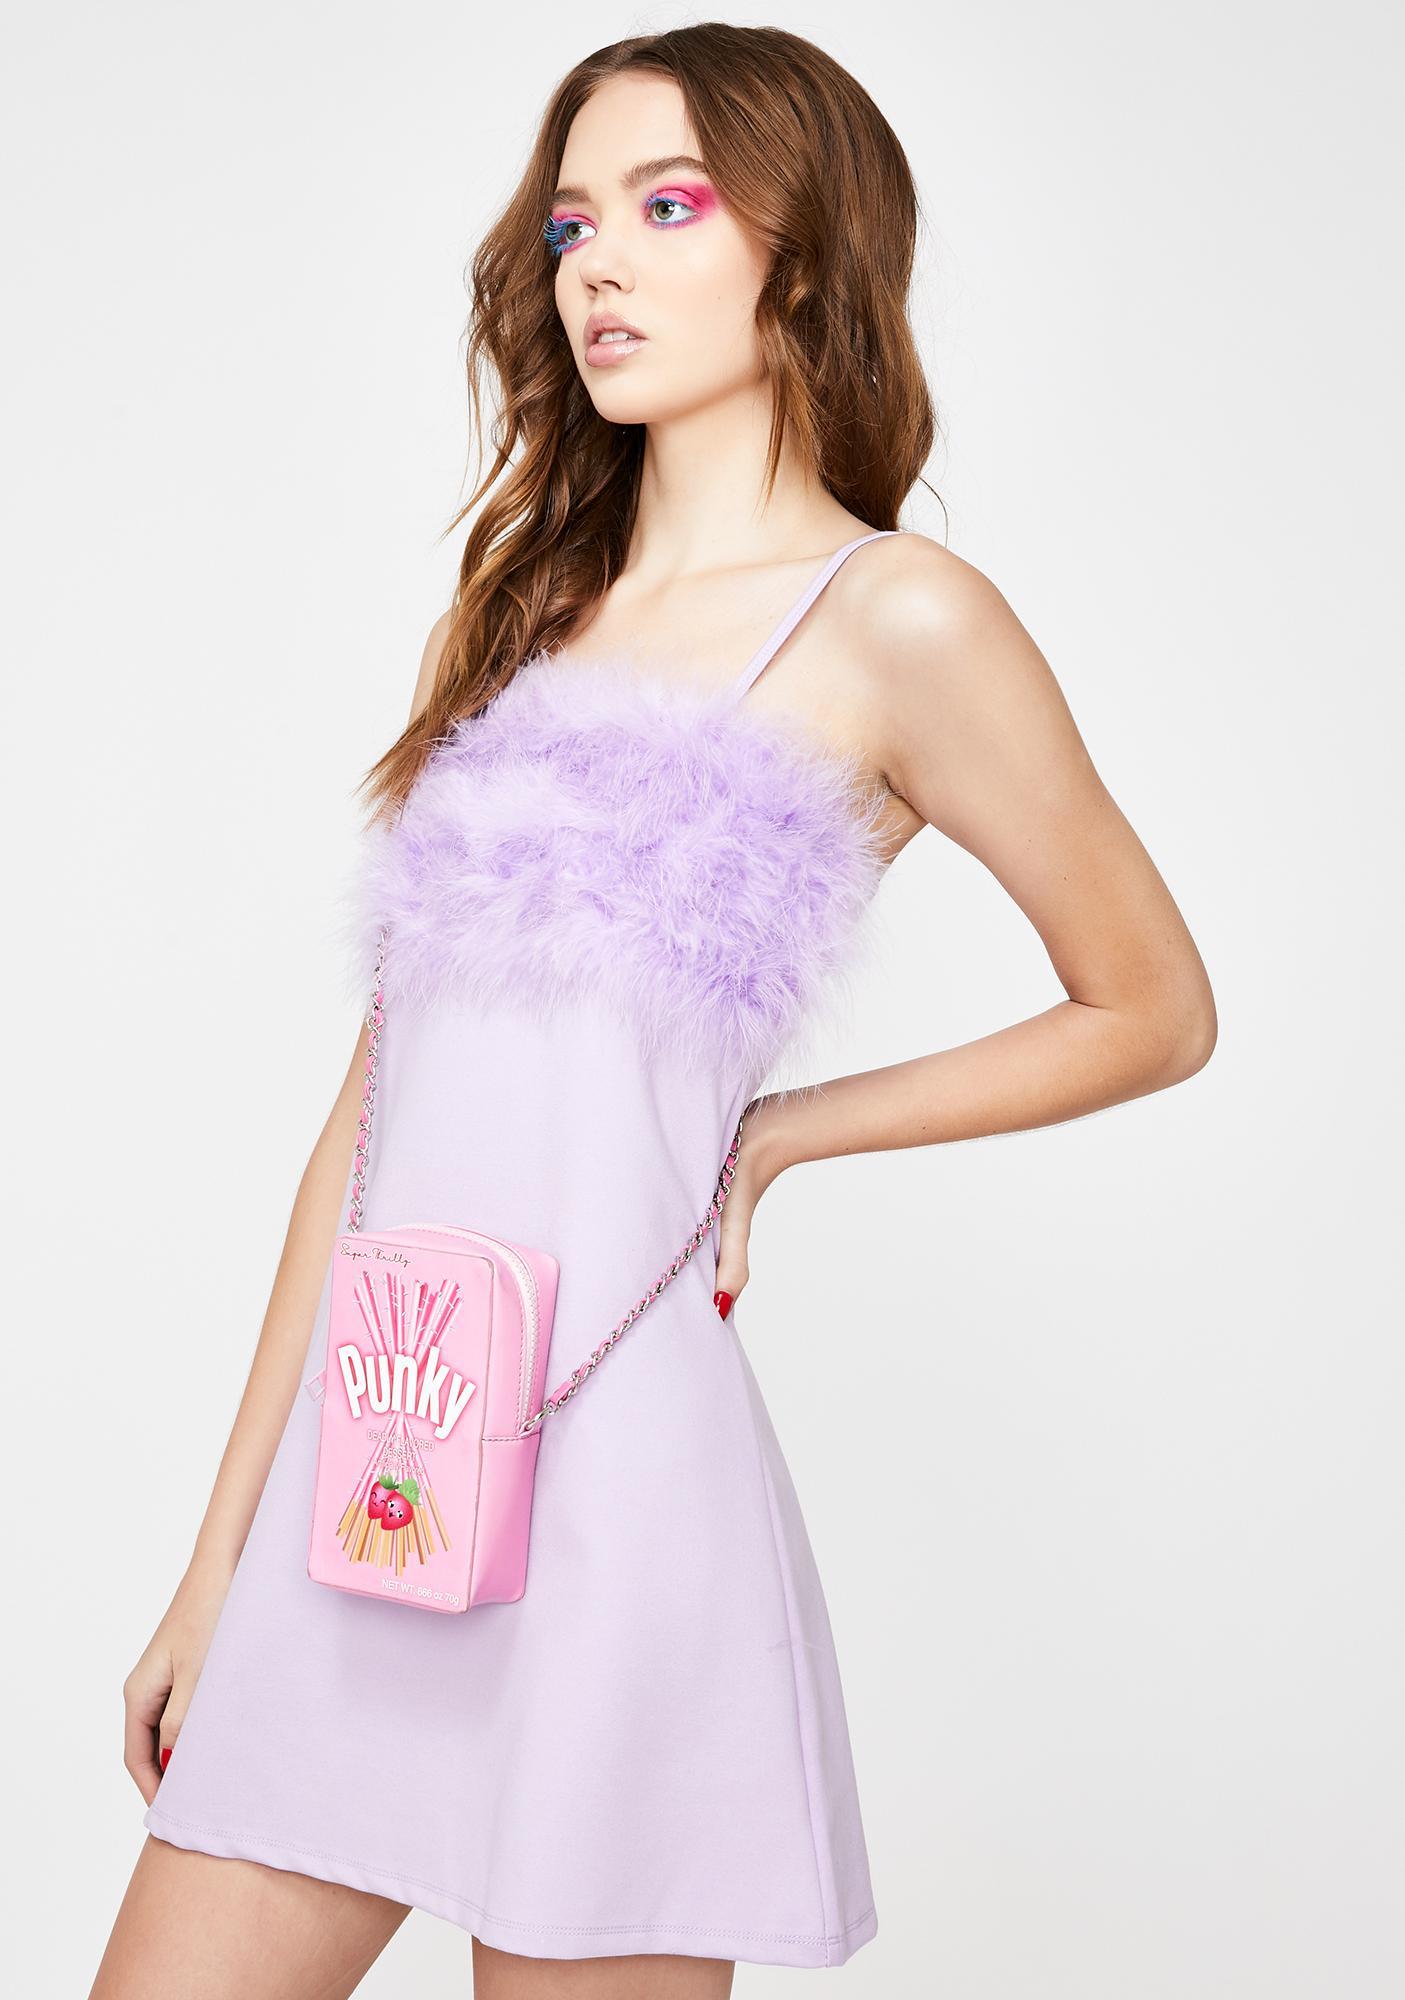 Sugar Thrillz Fairy Flirty N' Thriving Marabou Dress